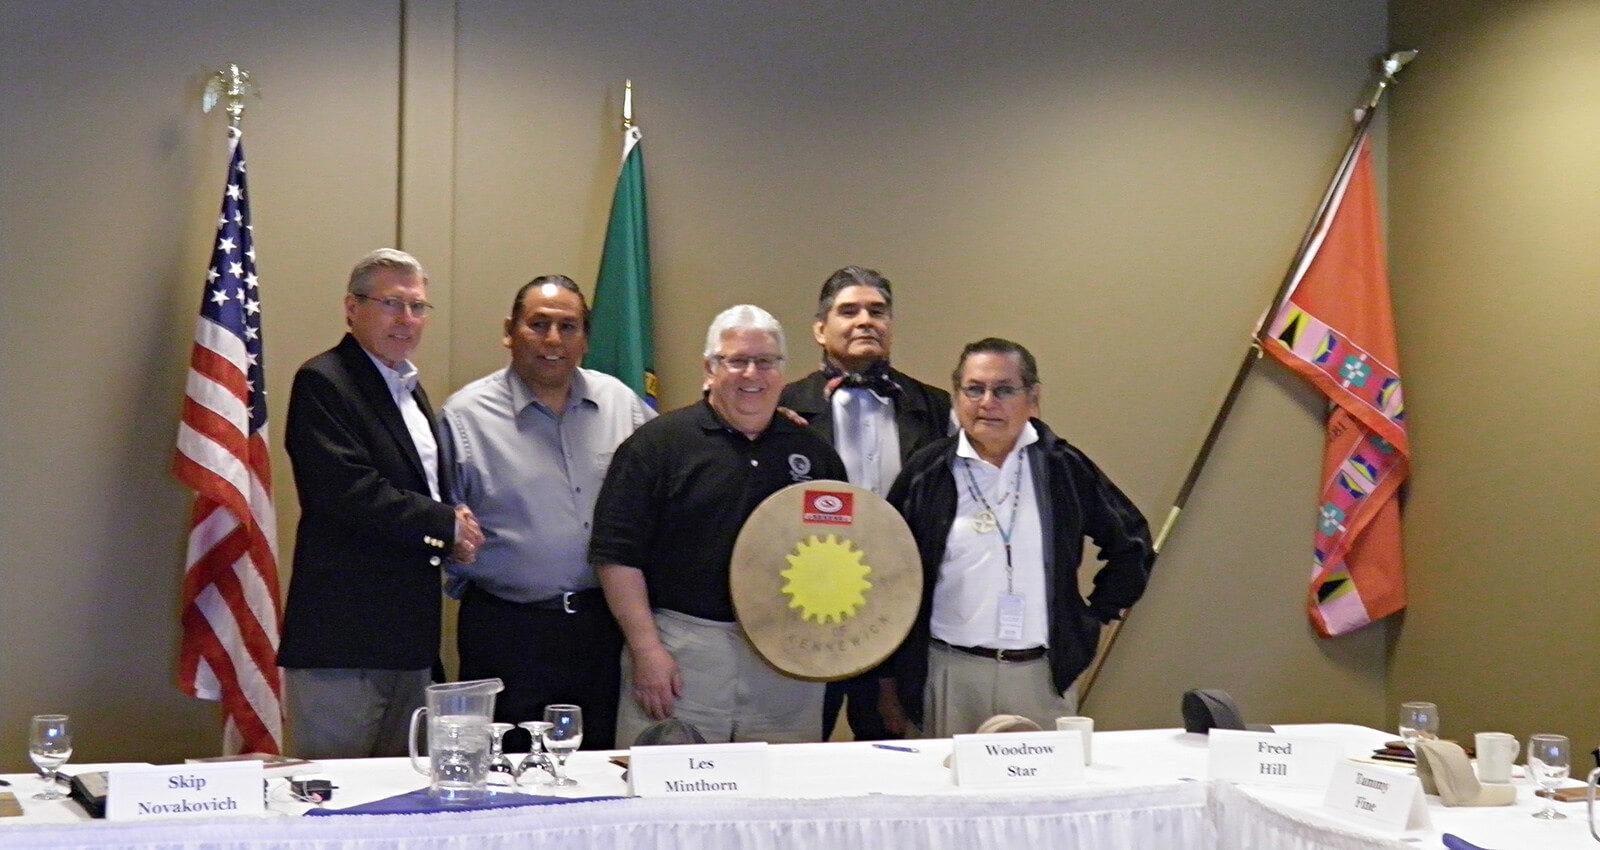 Confederated Tribal representatives present ceremonial drum to Port Commissioners.